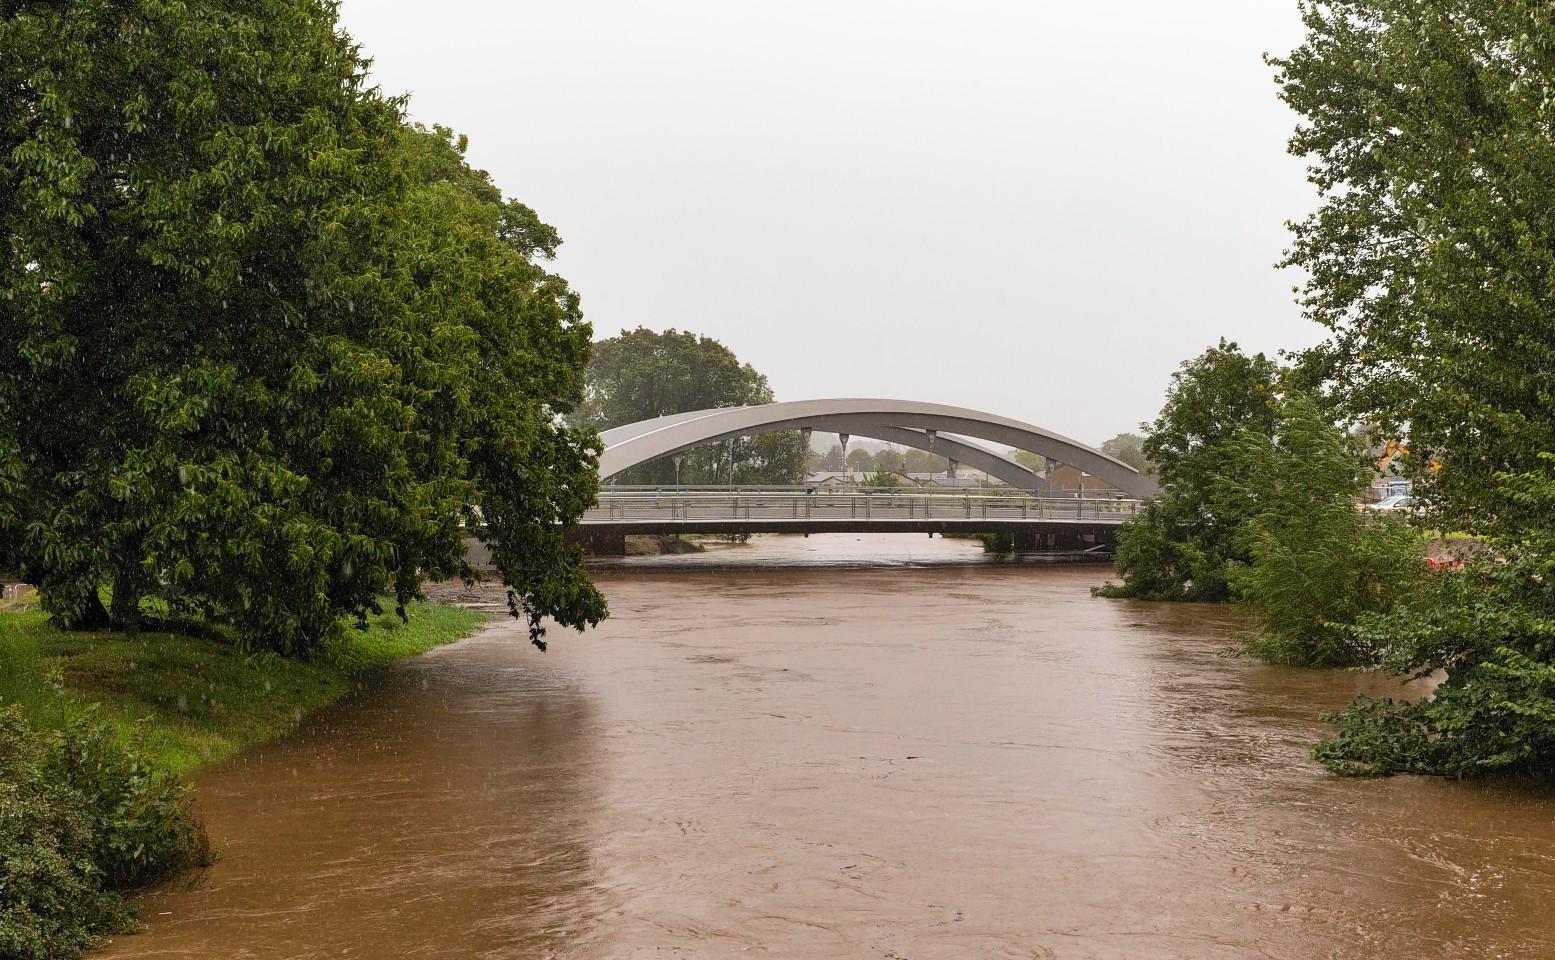 Flooding caused major problems across Moray. Pic credit: Jasper Image